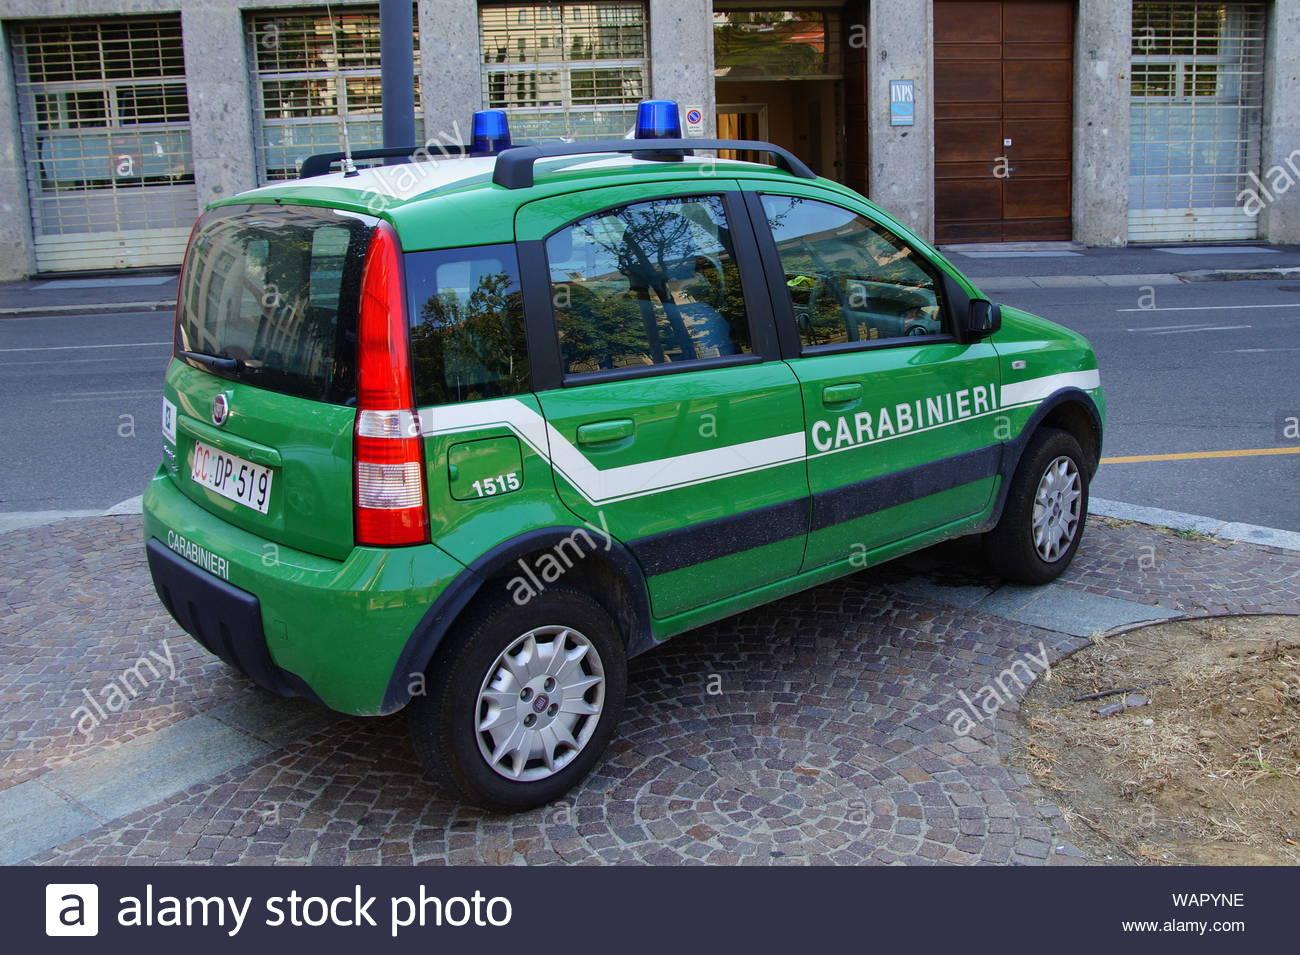 bergamo-lombardije-italy-august-17-2017-italian-carabinieri-military-police-police-car-fiat-pa...jpg